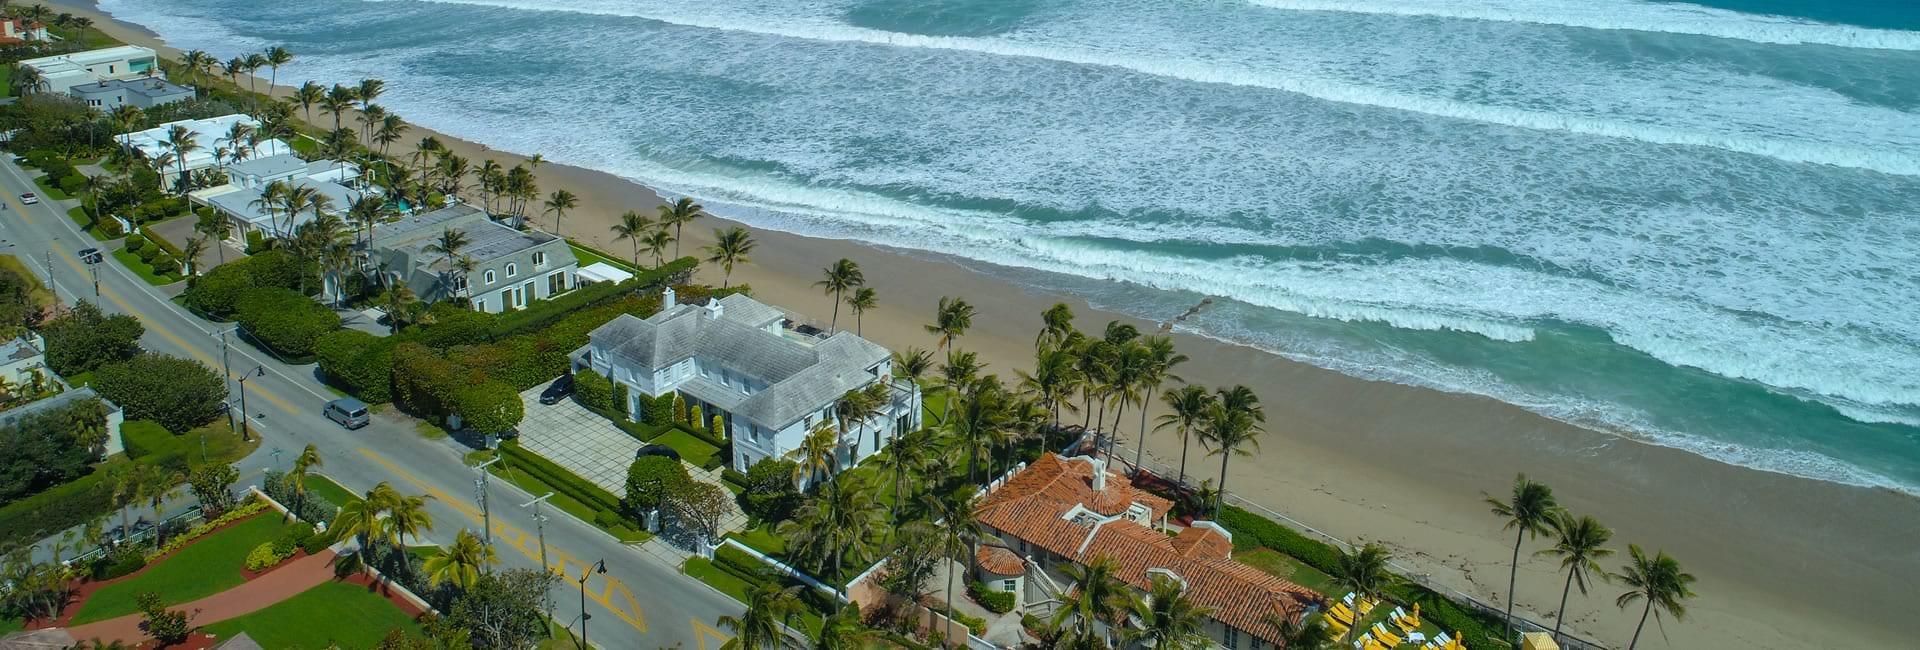 Home Watch Services Palm Beach Florida